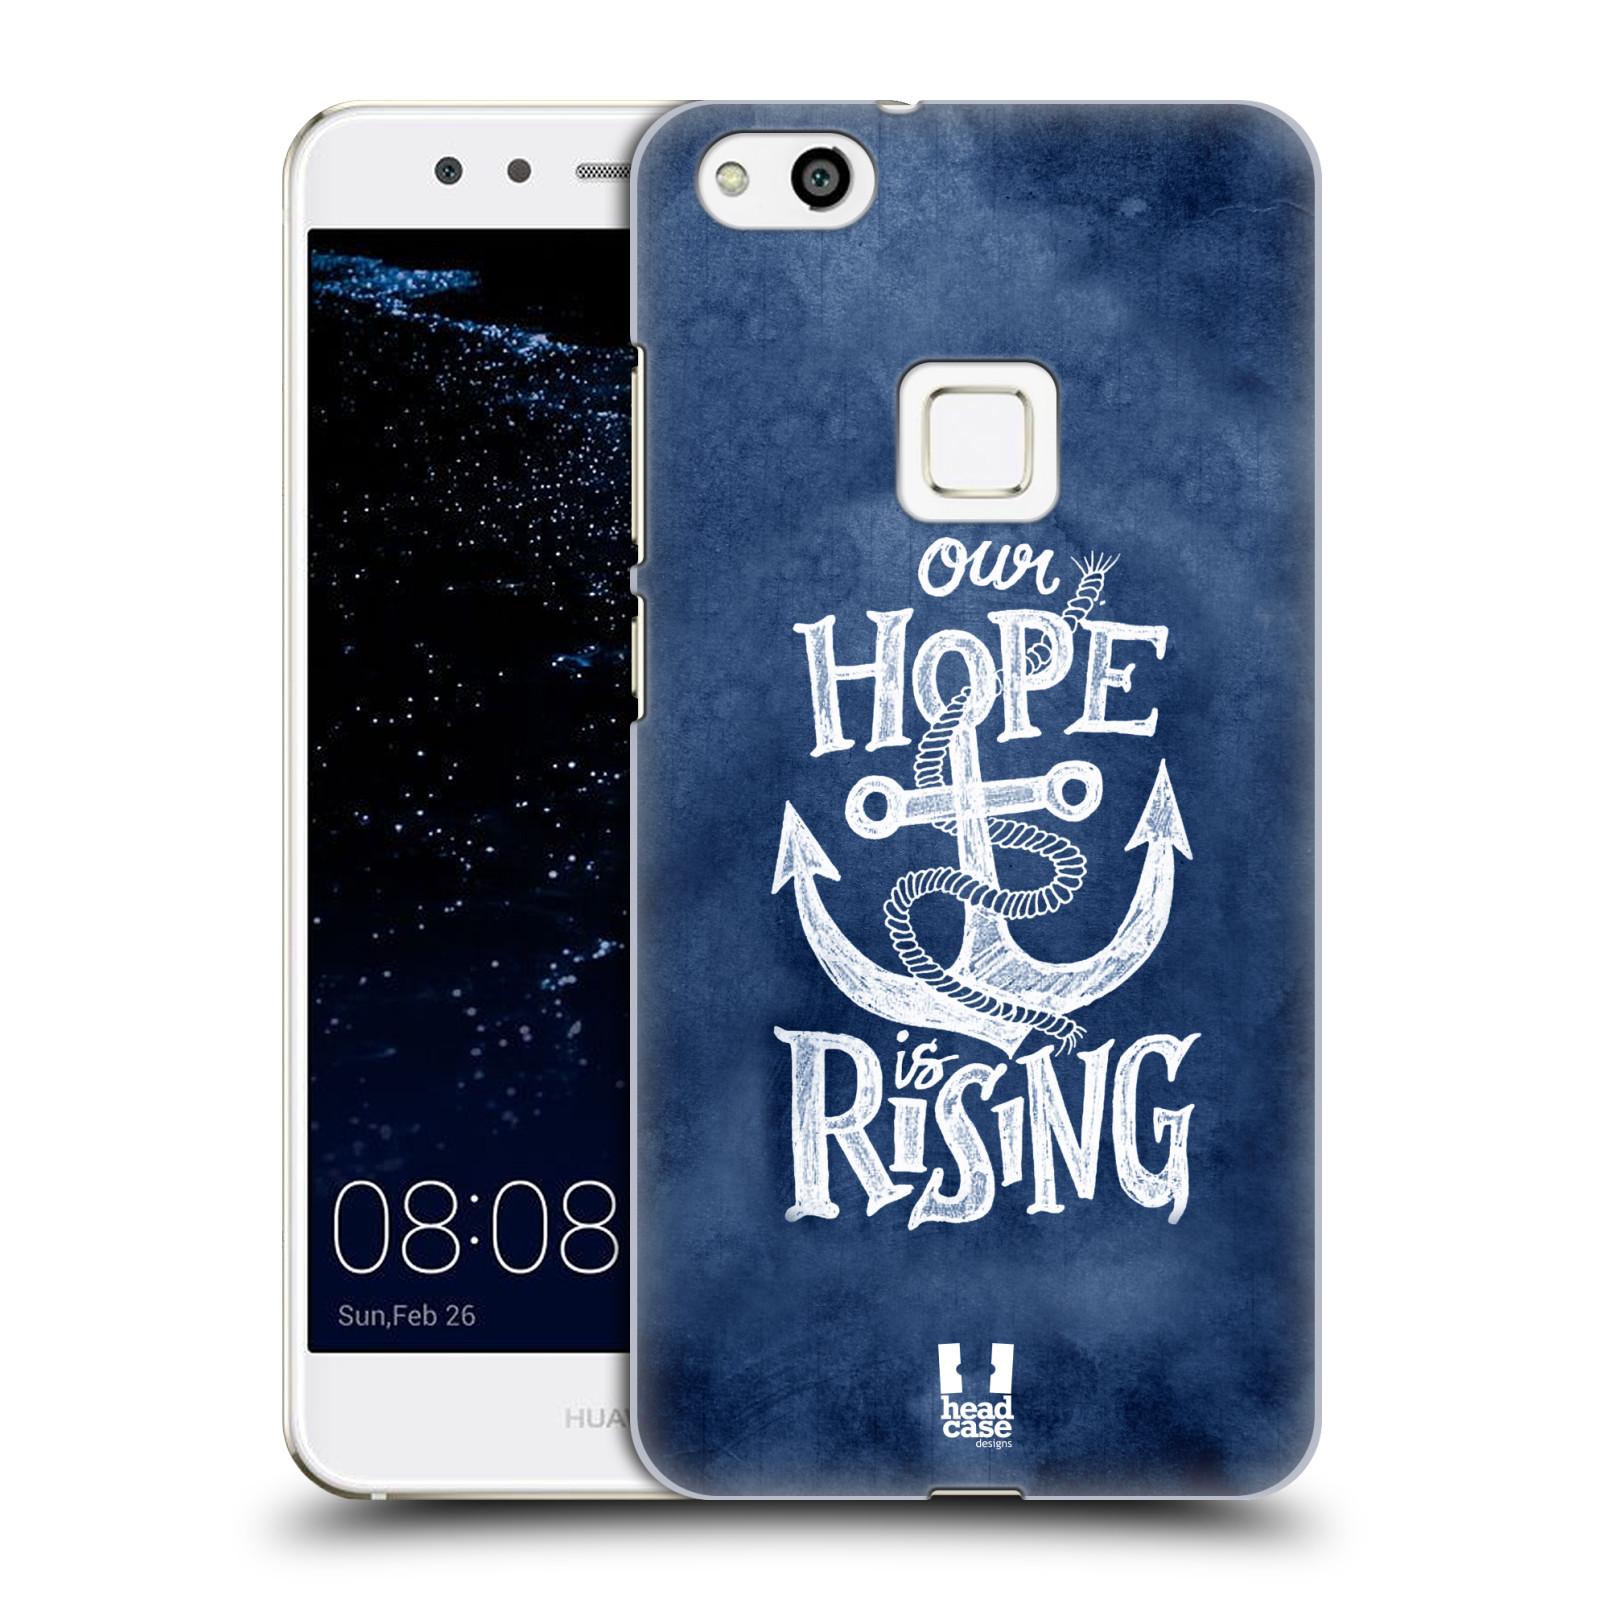 Plastové pouzdro na mobil Huawei P10 Lite Head Case - KOTVA RISING (Plastový kryt či obal na mobilní telefon Huawei P10 Lite Dual SIM (LX1/LX1A))